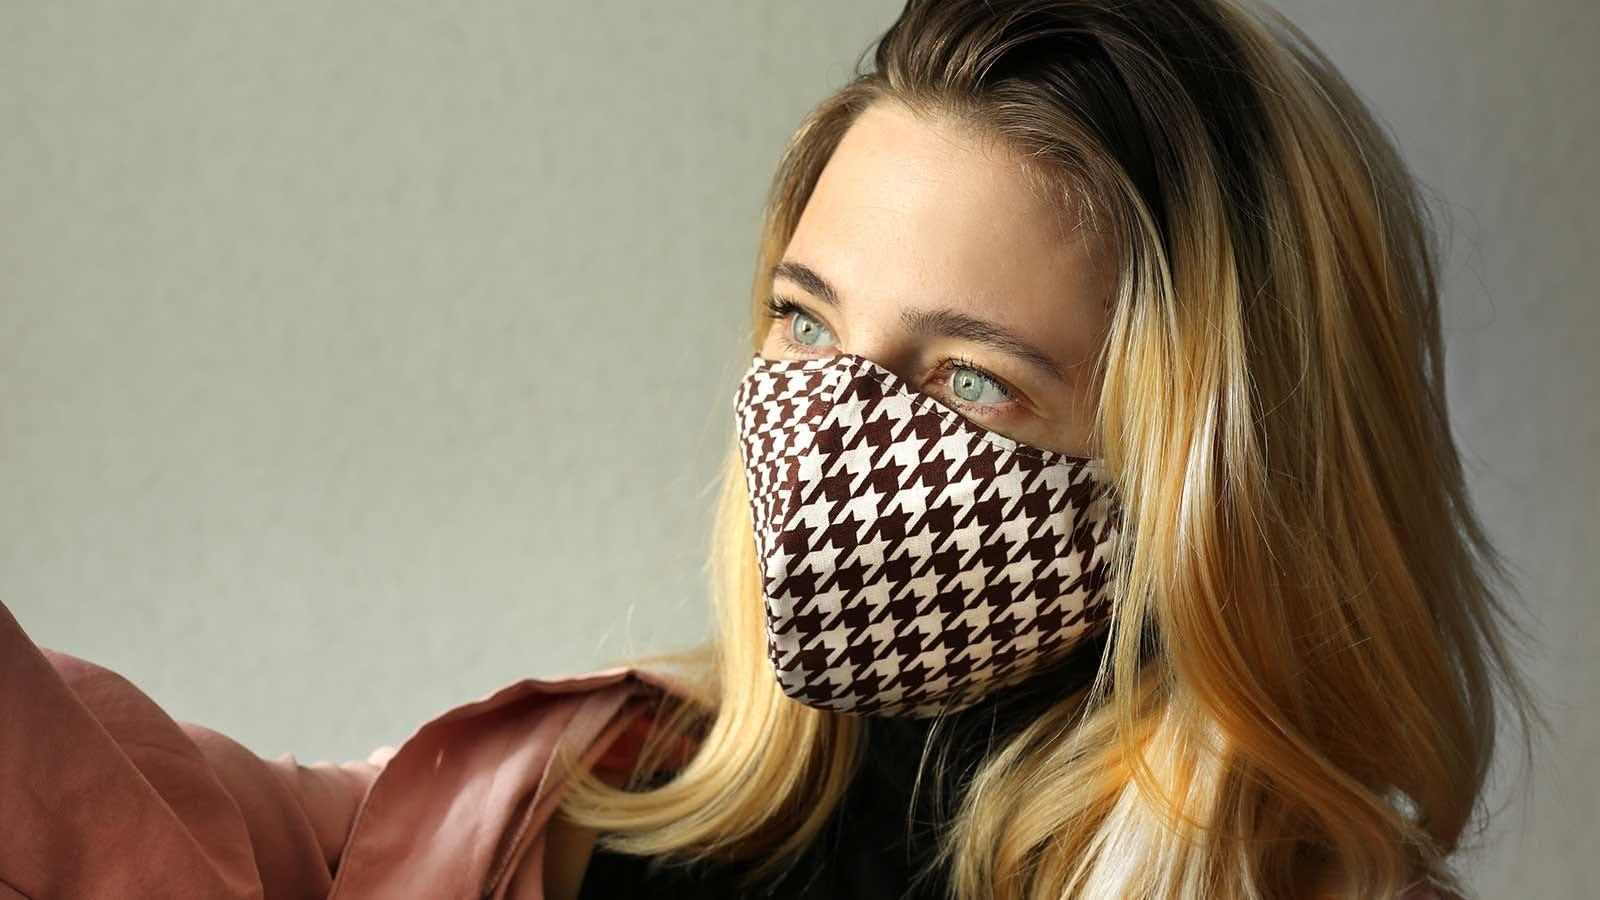 A woman wearing a snug-fitting cloth mask.